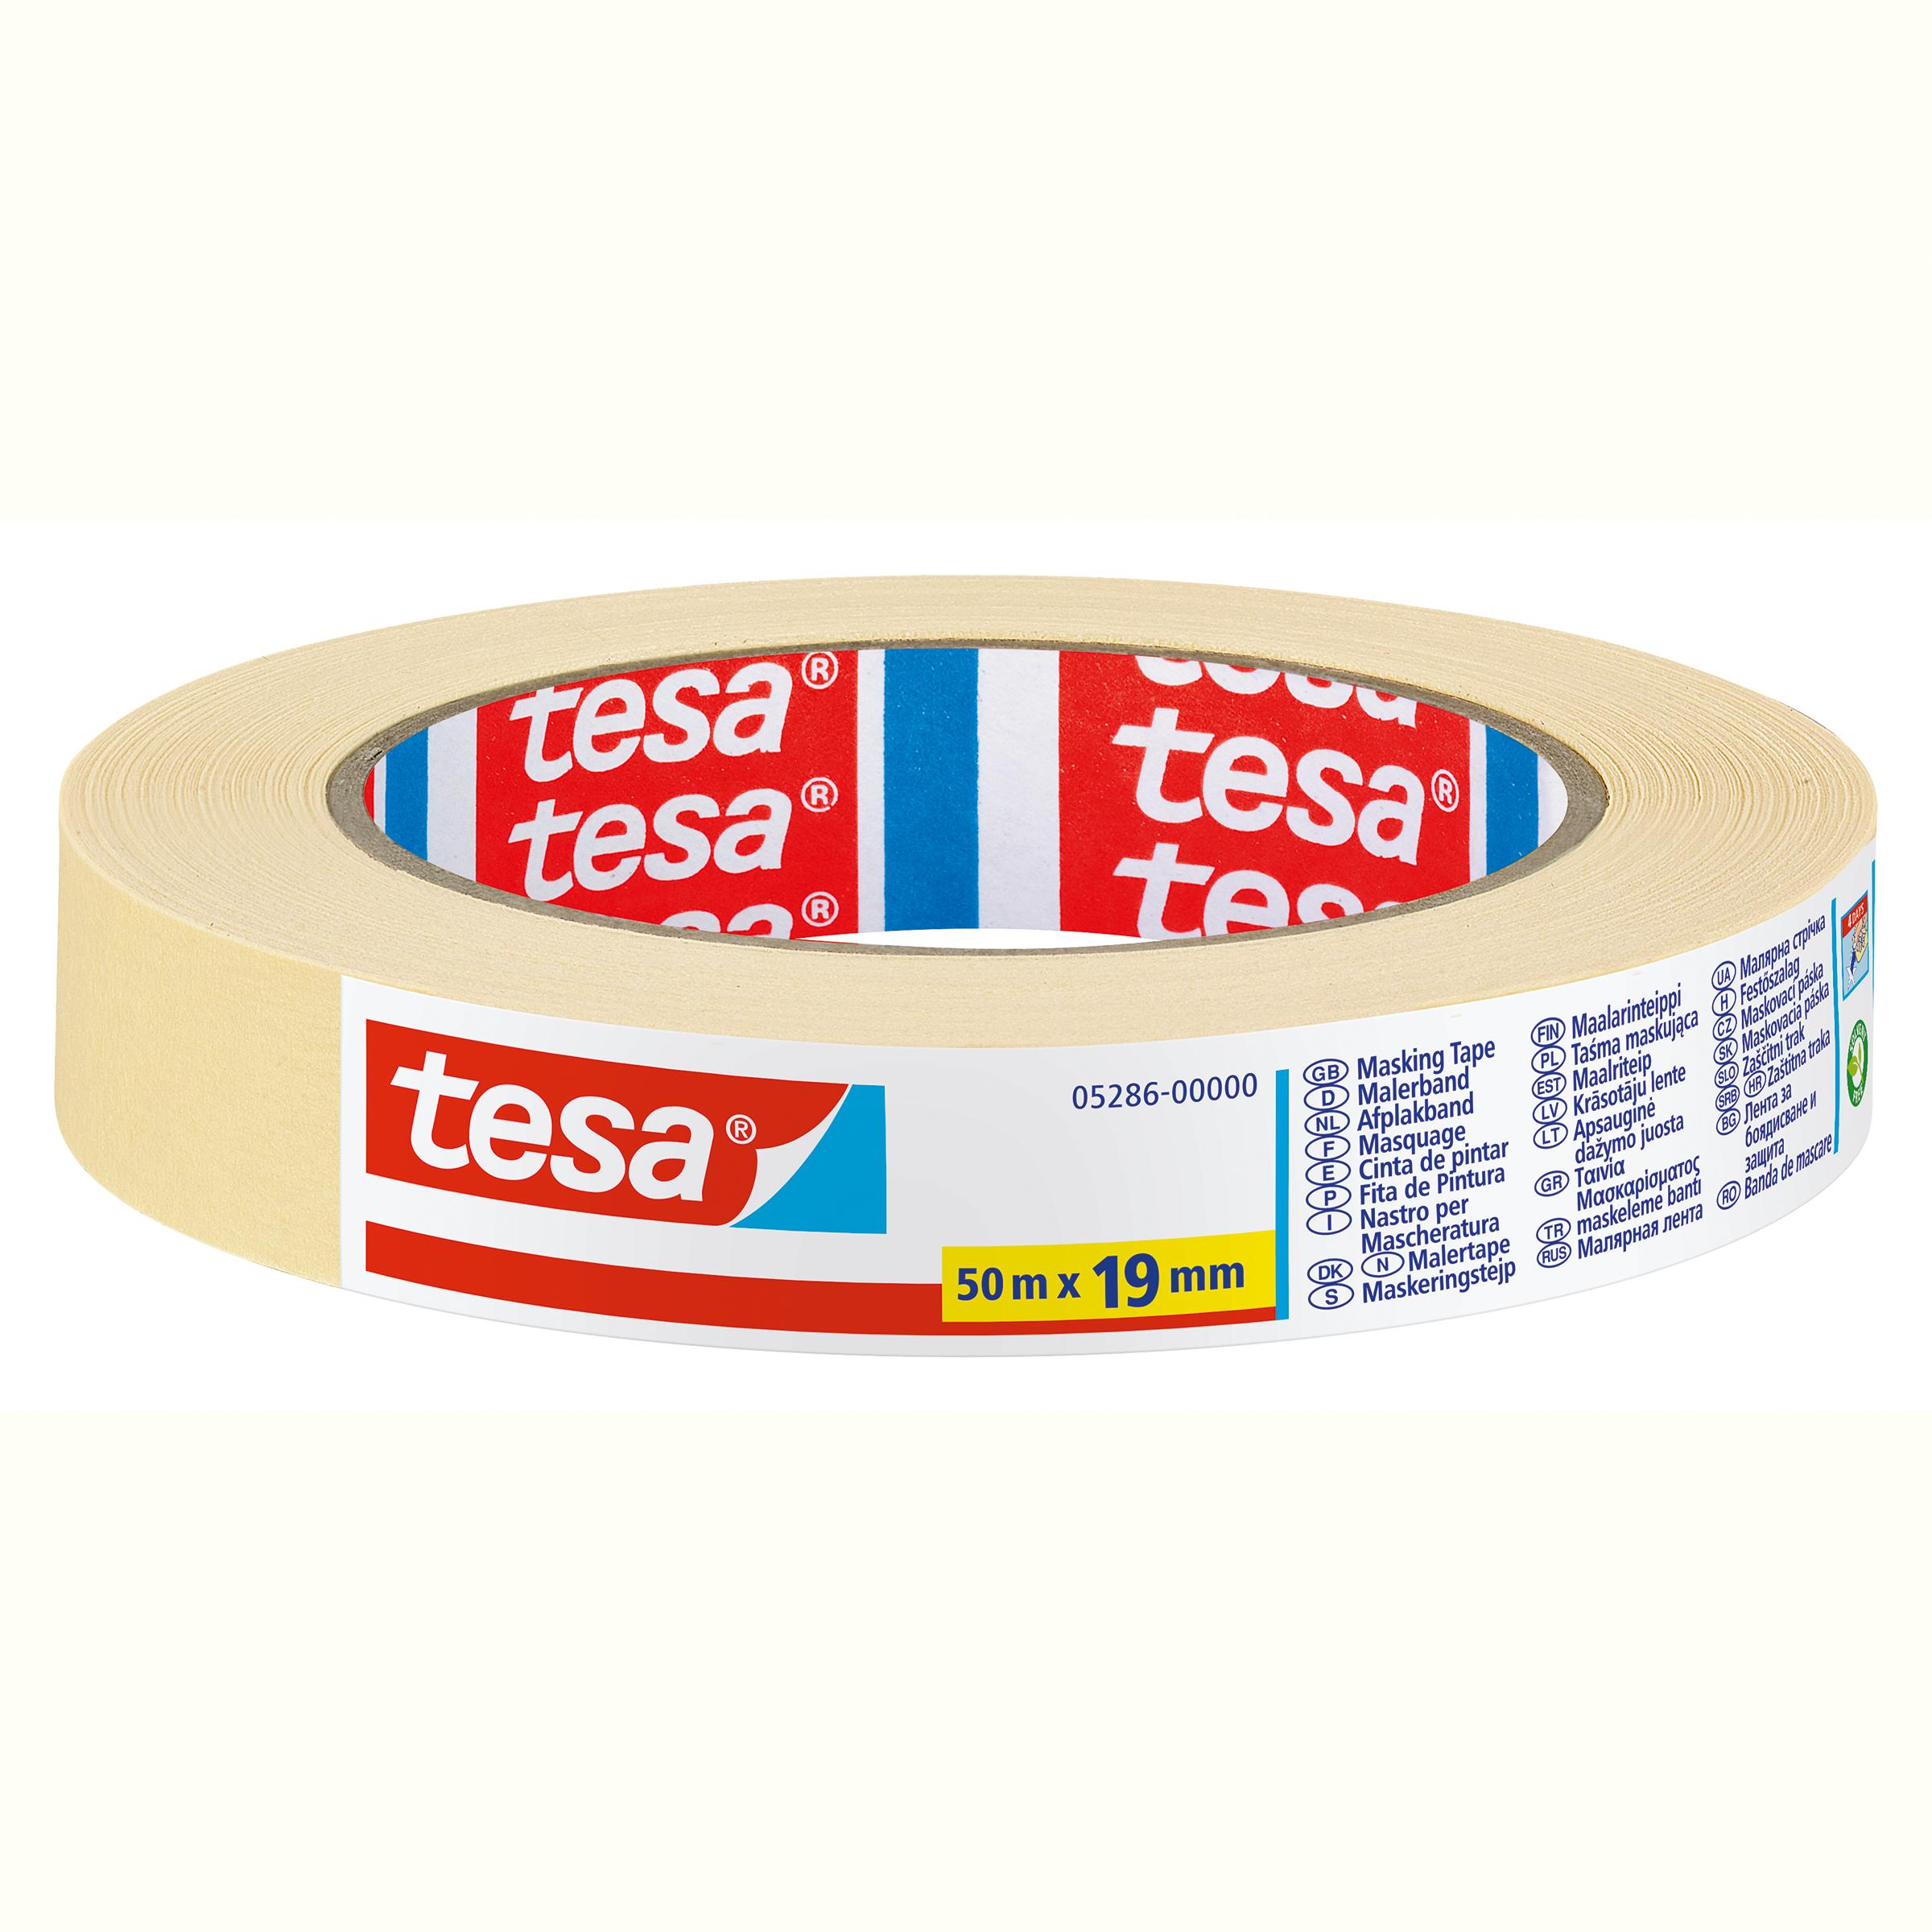 Tesa 05286 - Maler-Abdeckband - Papier - Beige - 4 Tag(e) - 50 m - 19 mm